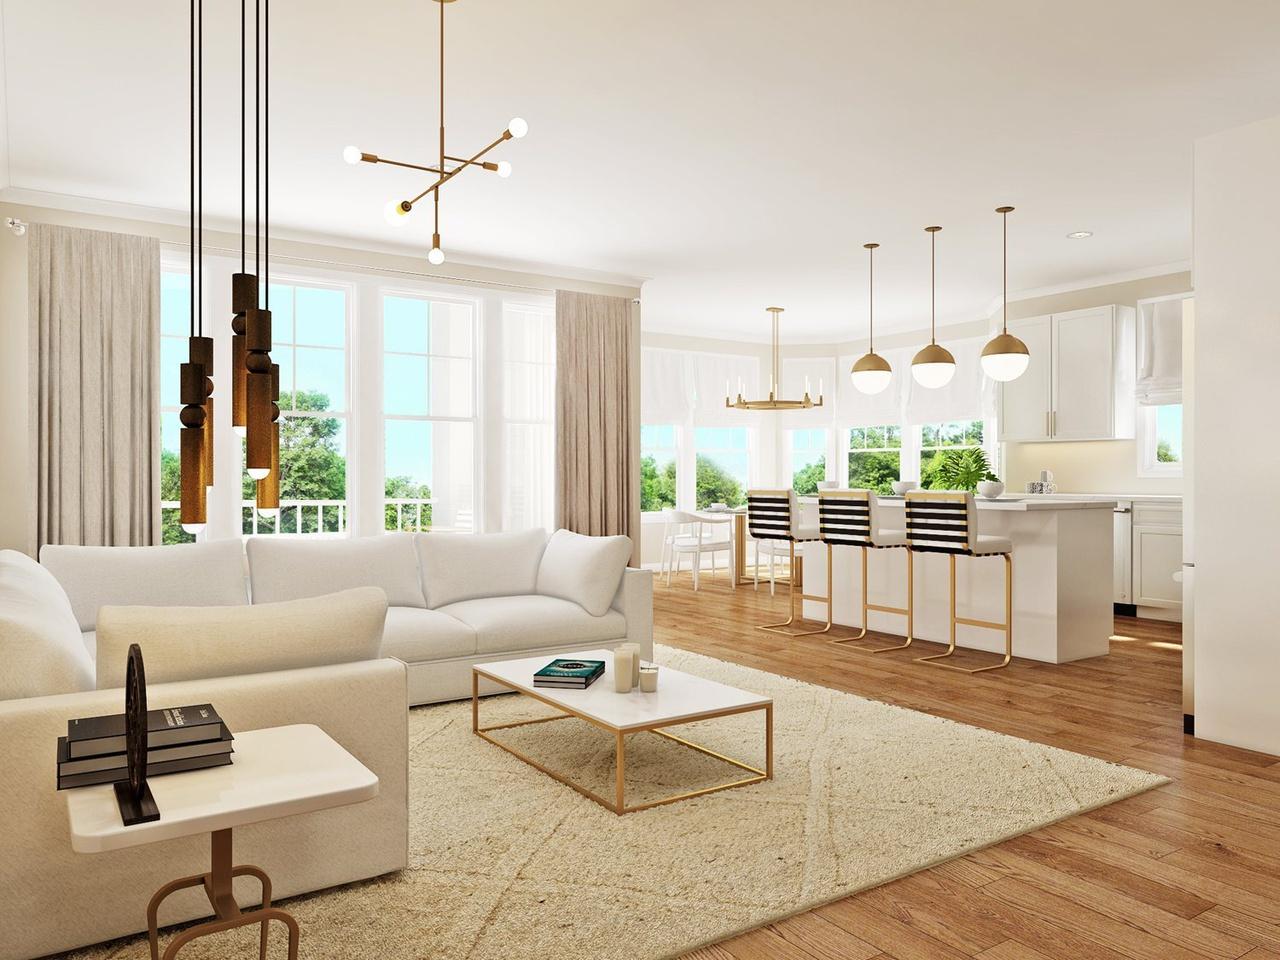 Cambridge, Plainview, NY 11803 ($775,000+) | Redfin